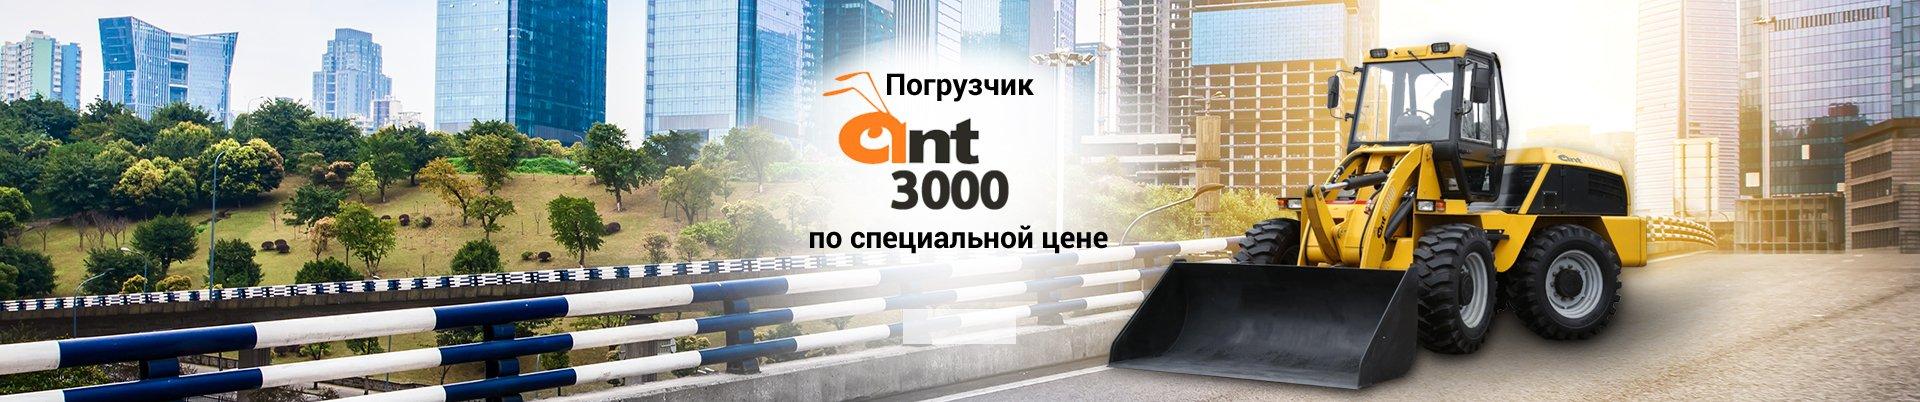 b3000